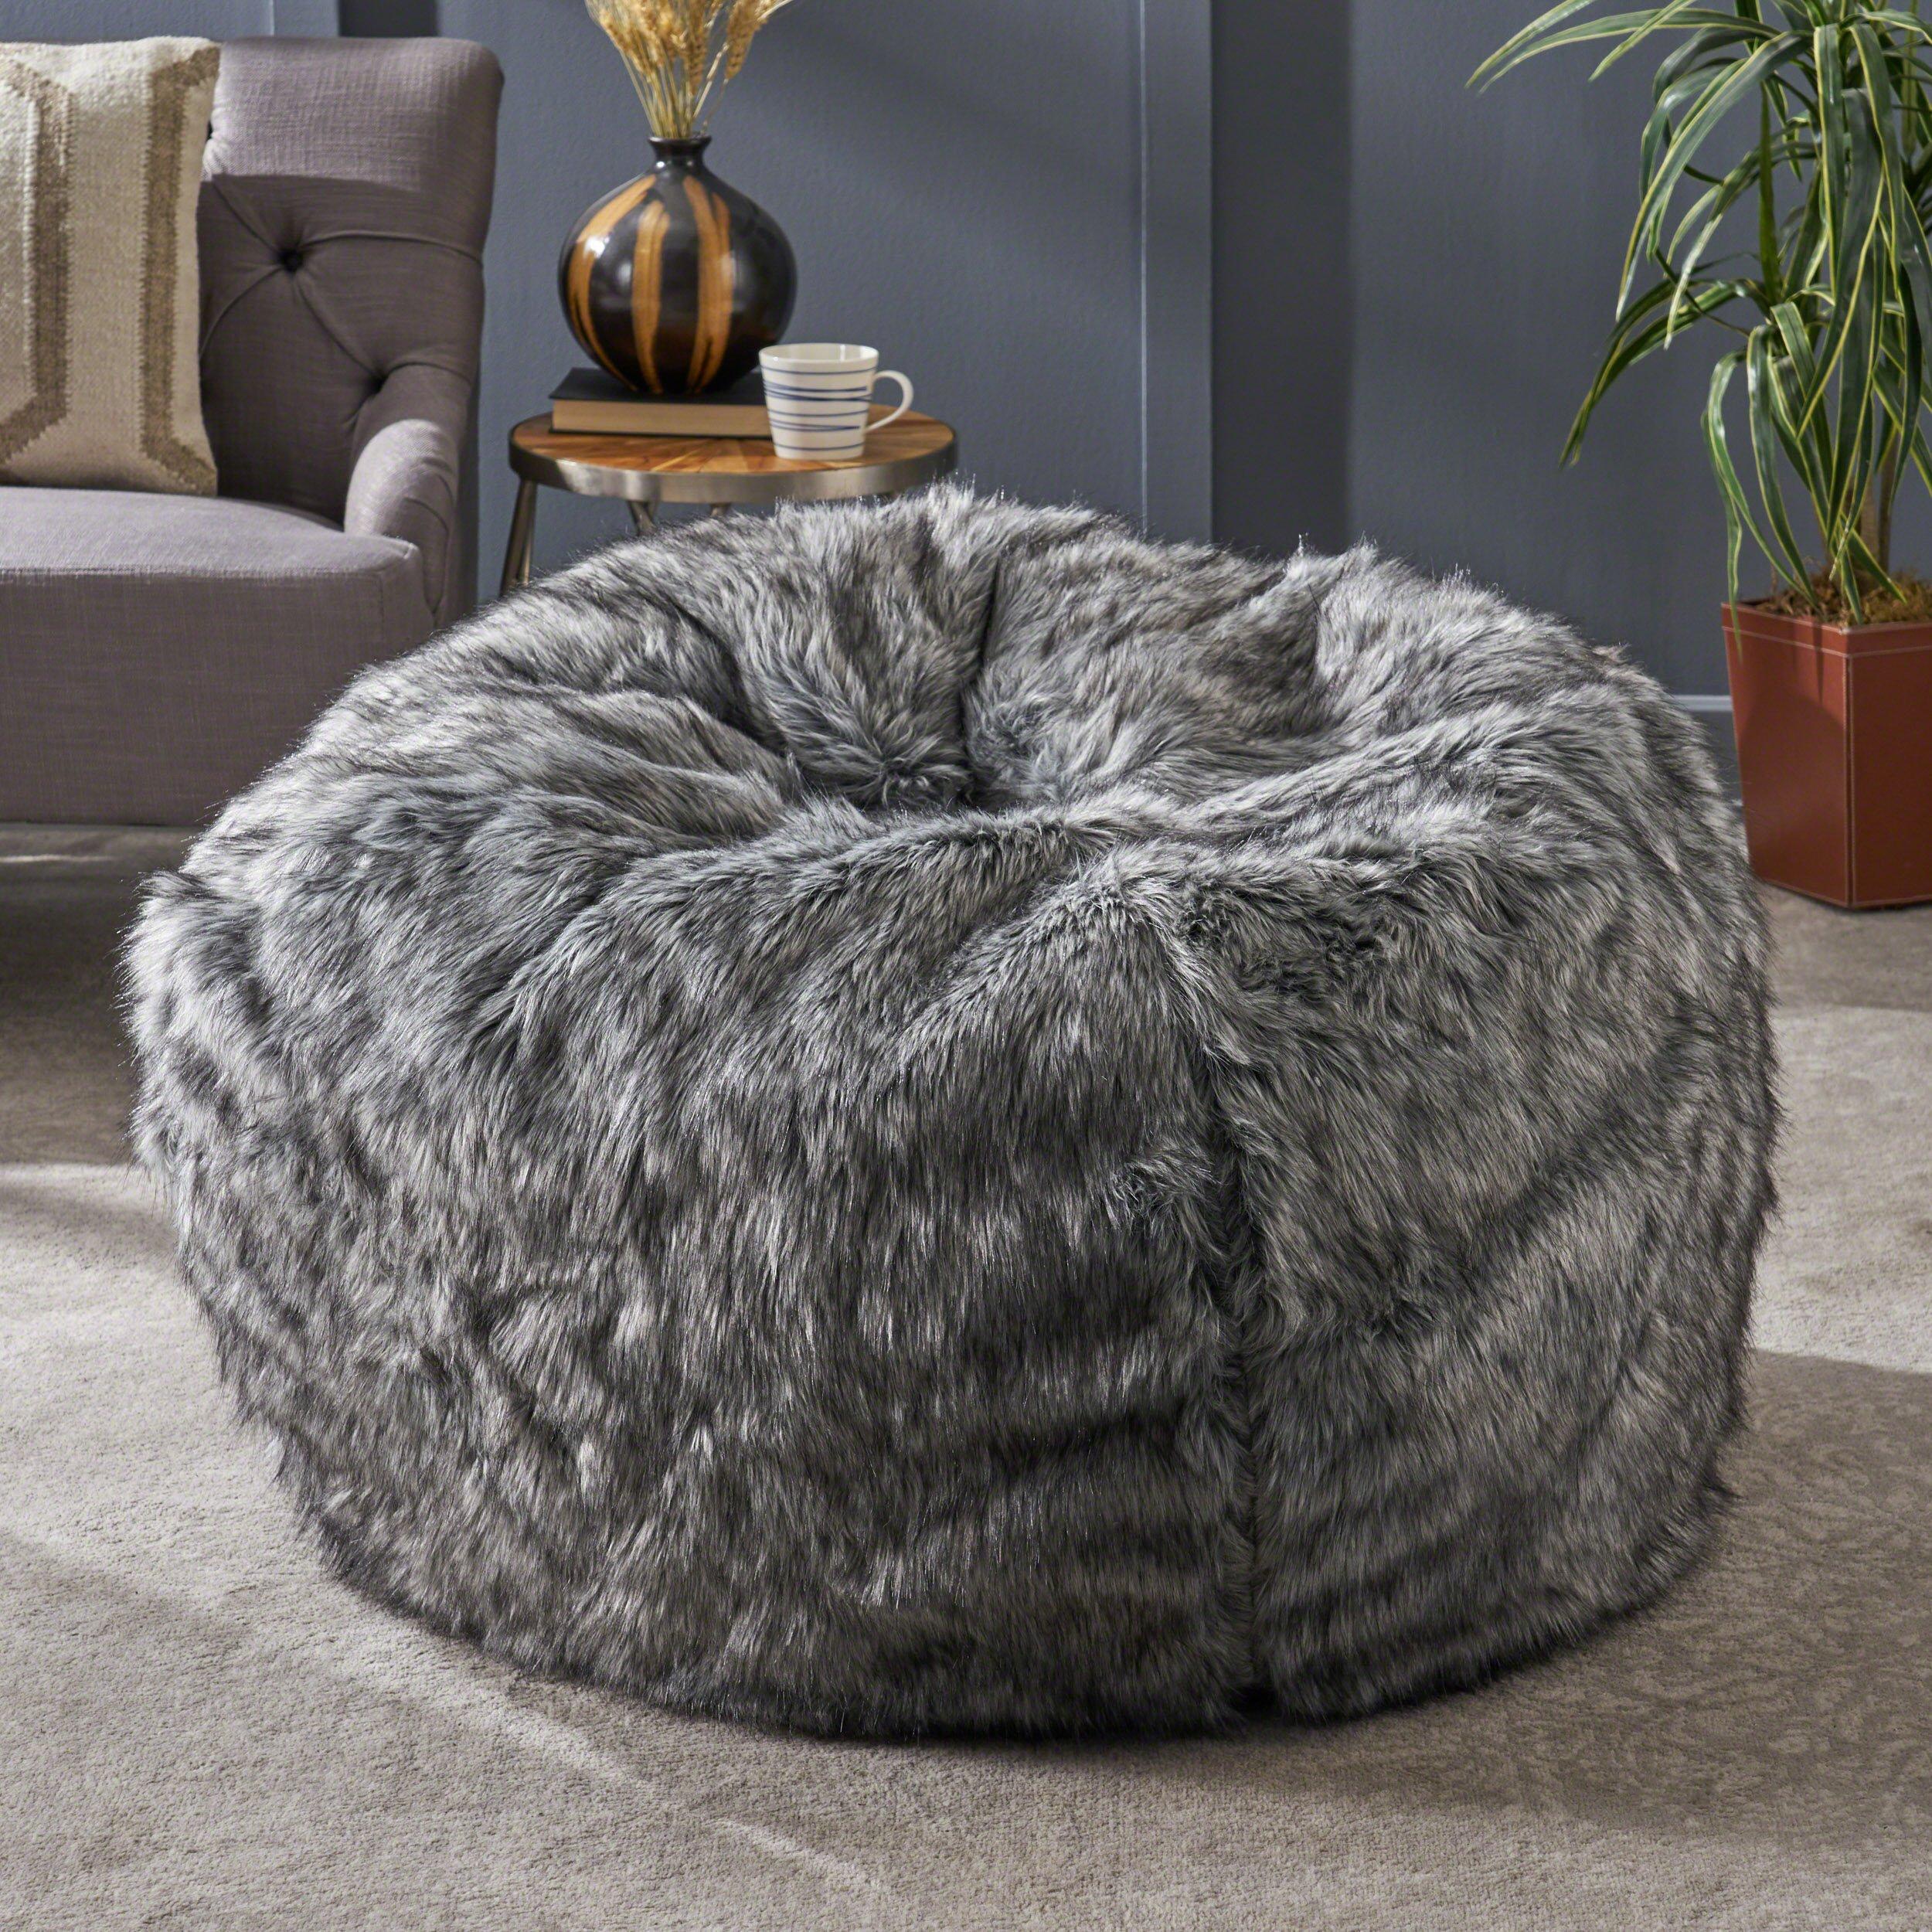 Christopher Knight Home Laraine Furry Glam Dark Light Grey Streak Faux Fur 3 Ft. Bean Bag by Christopher Knight Home